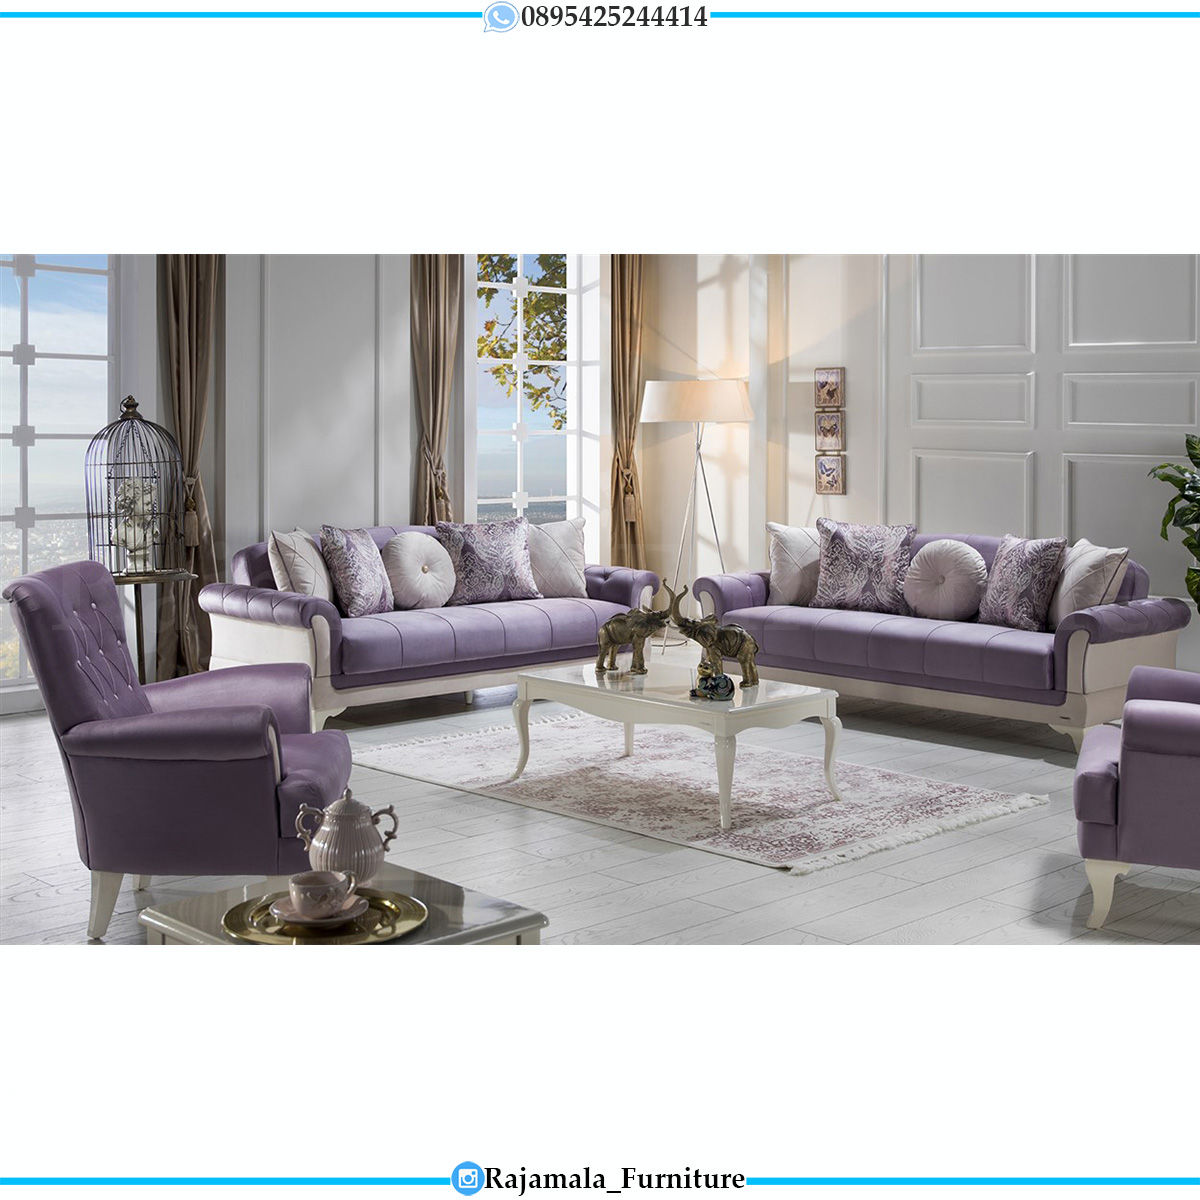 Sofa Minimalis Terbaru Luxury Set Furniture Jepara Kekinian RM-739